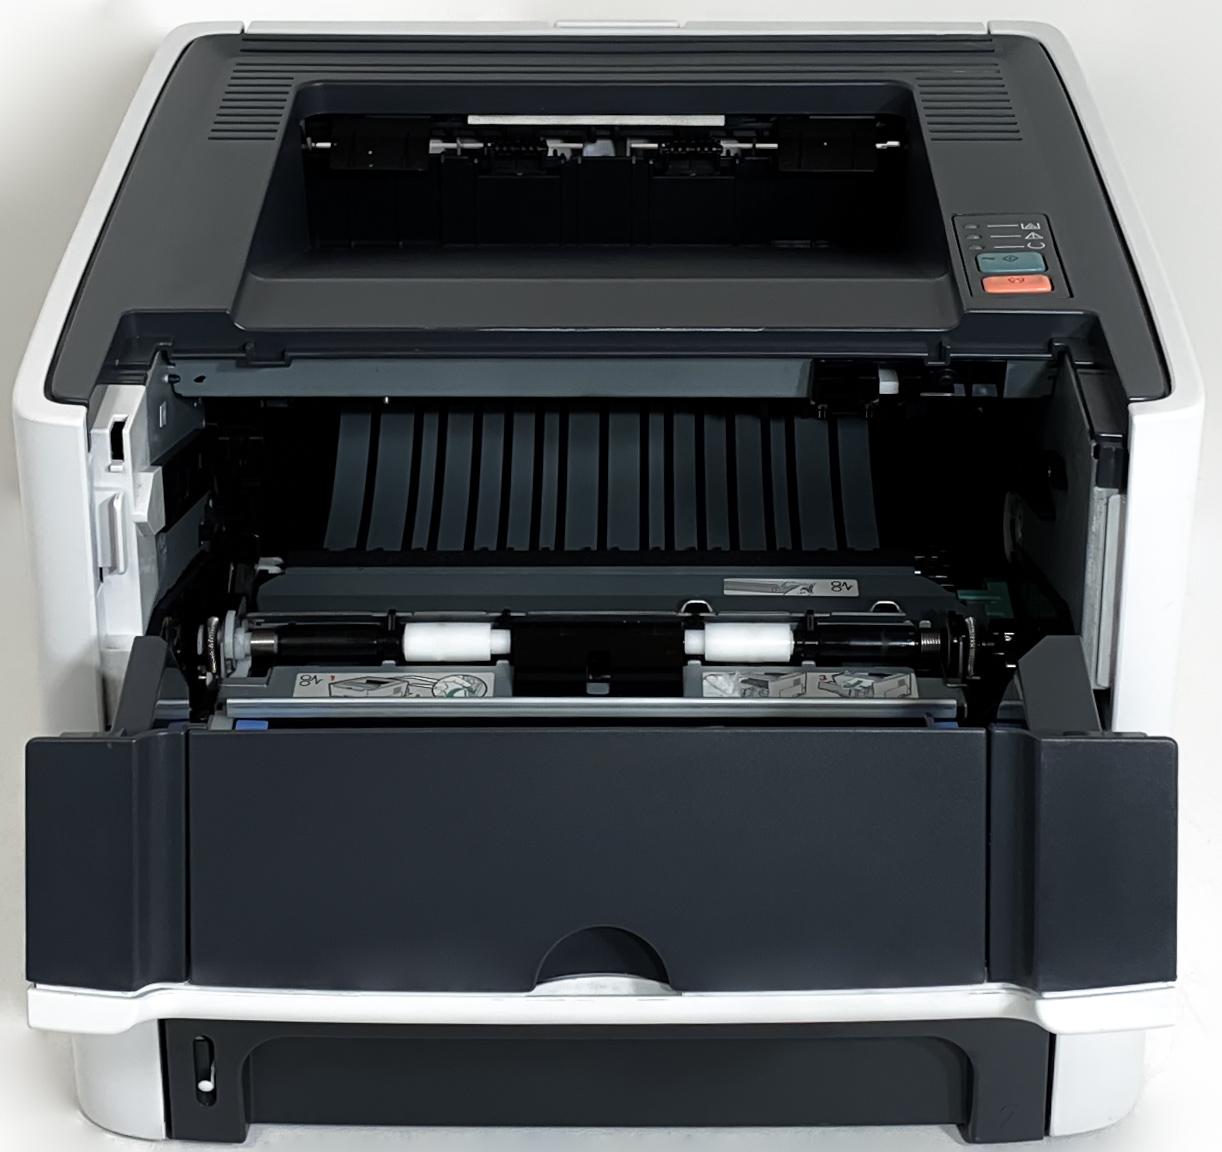 HP 1320 Printer